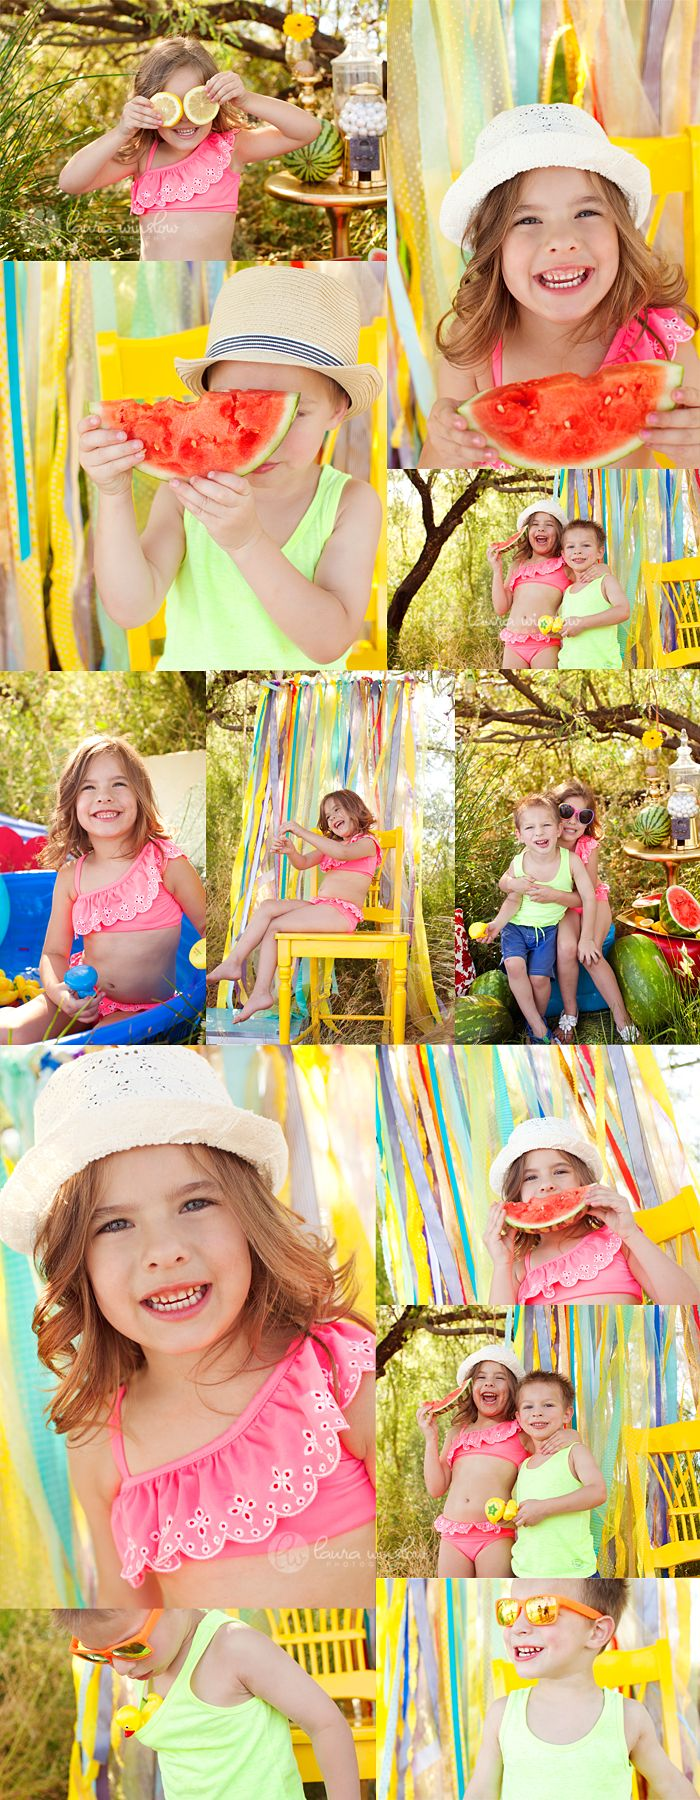 Summer Watermelon + Lemon Mini Sessions // Scottsdale Sibling Photographer » Phoenix, Scottsdale, Chandler, Gilbert Maternity, Newborn, Child, Family and Senior Photographer  Laura Winslow Photography {phoenix's modern photographer}